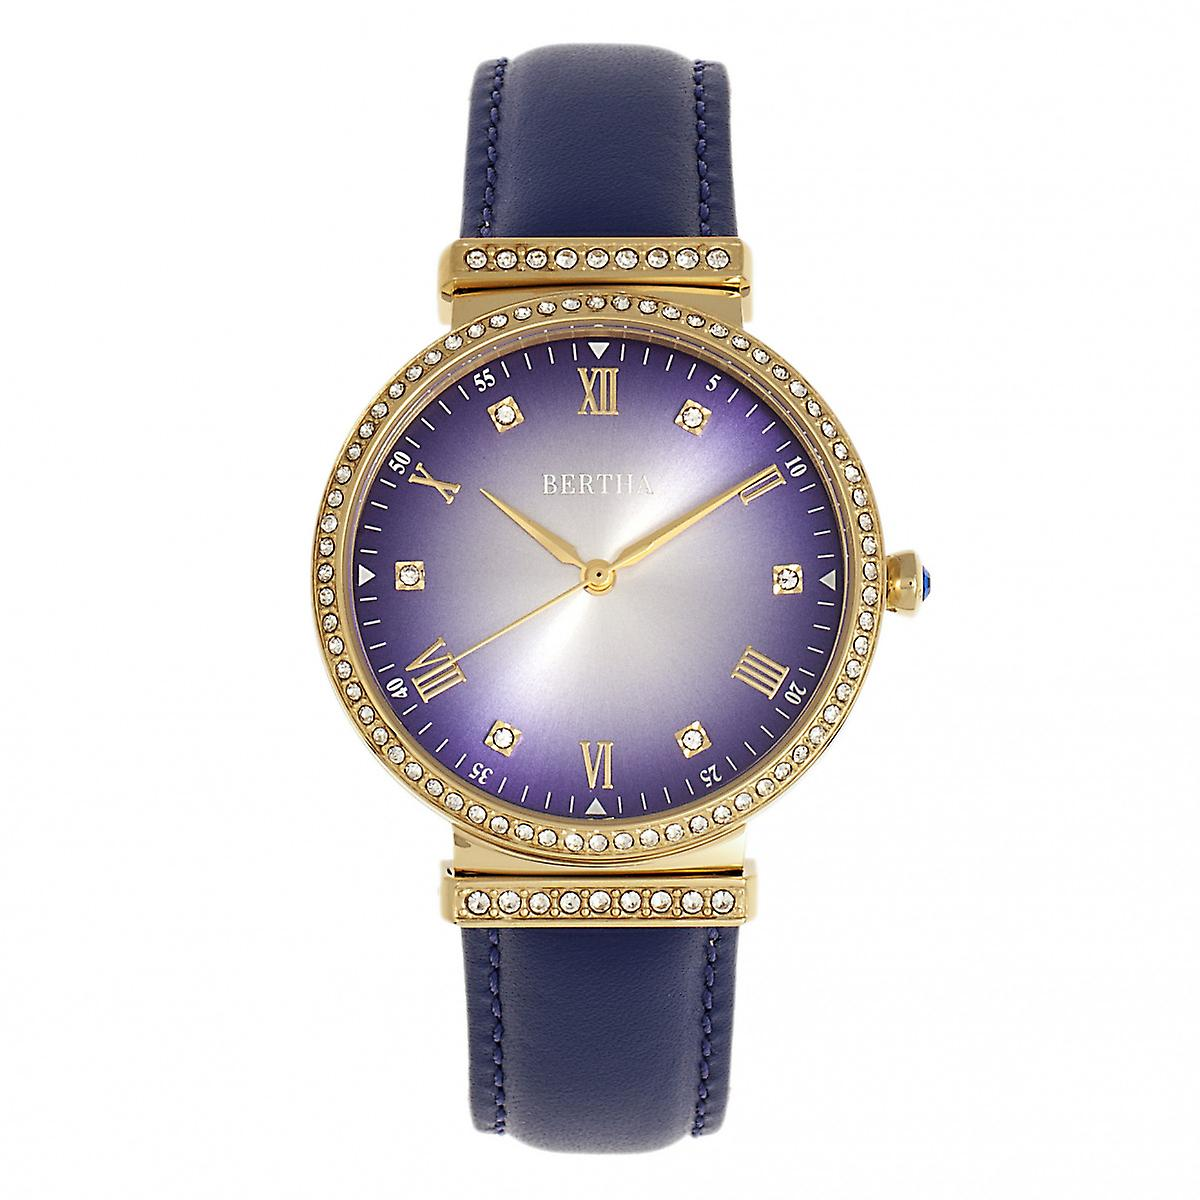 Bertha Allison Leather-Band Watch - Purple